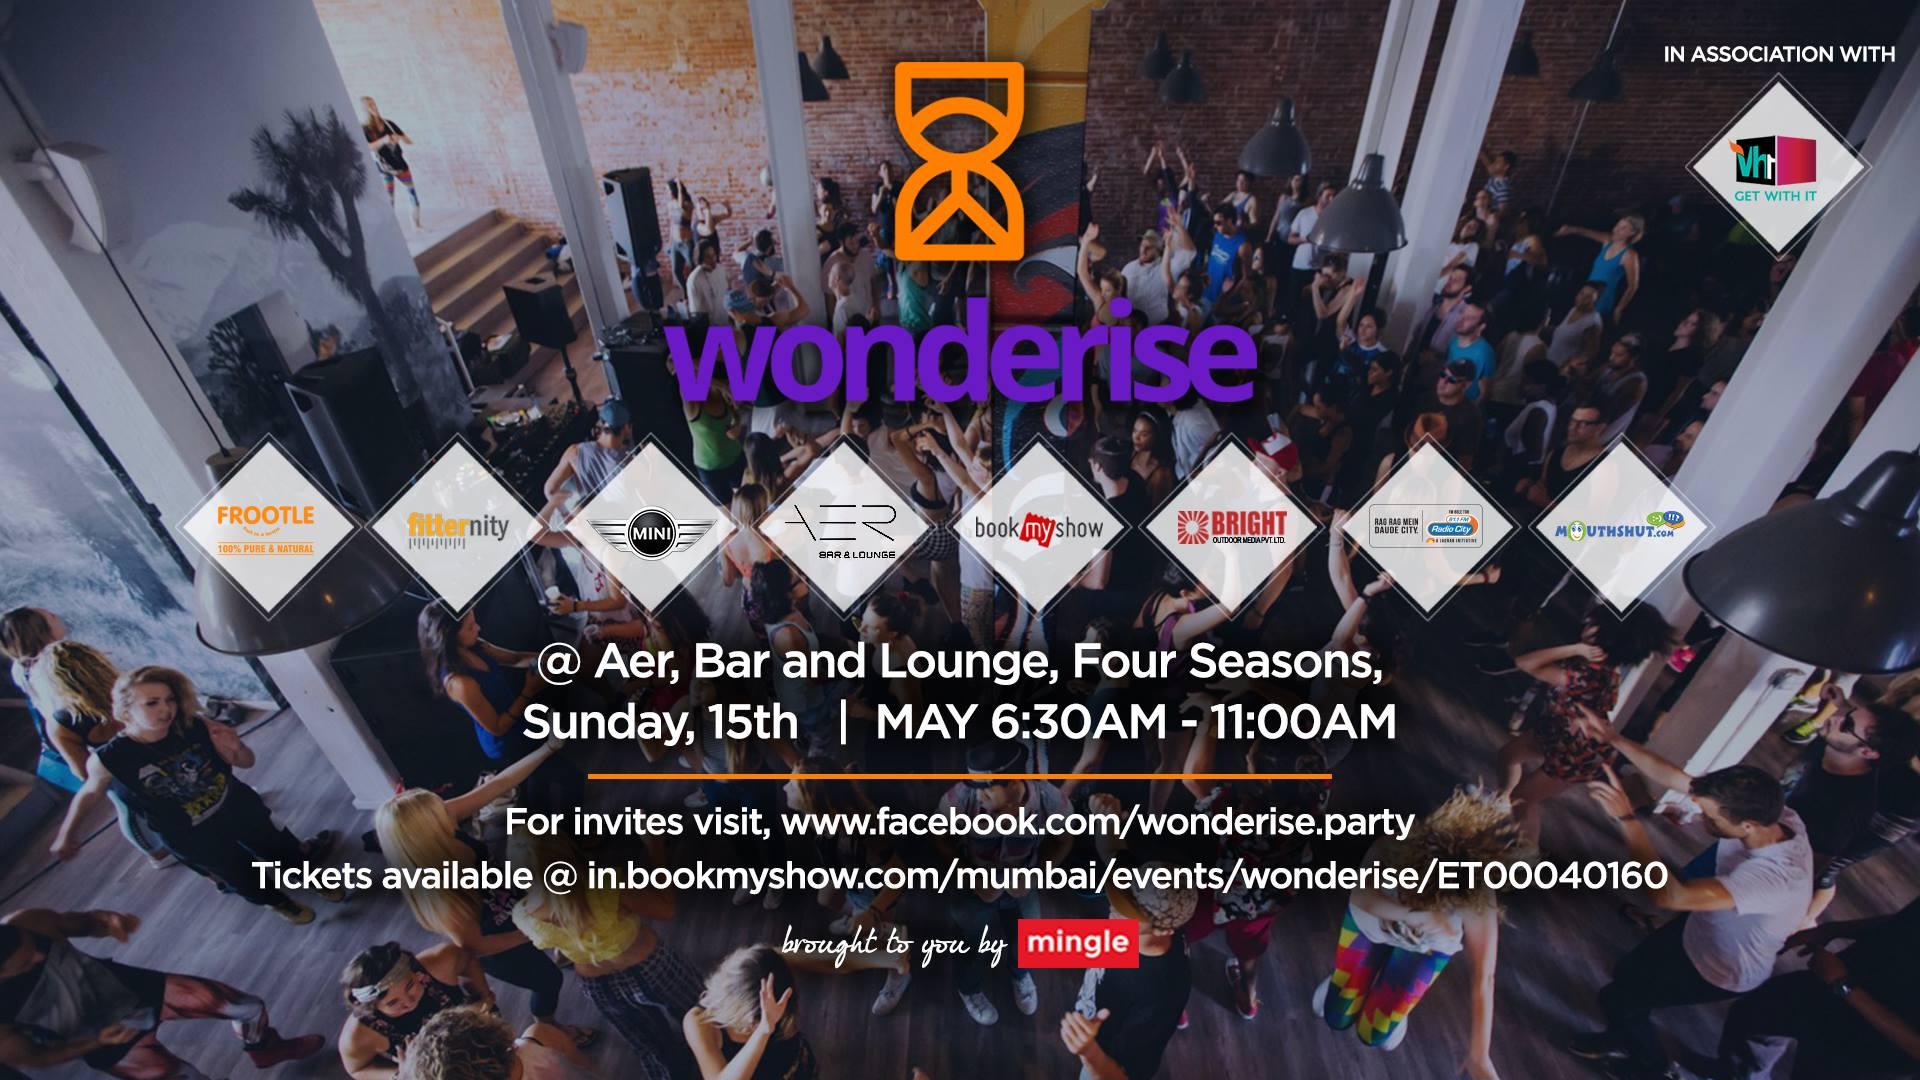 Wonderise Morning Party @ AER - Bar and Lounge